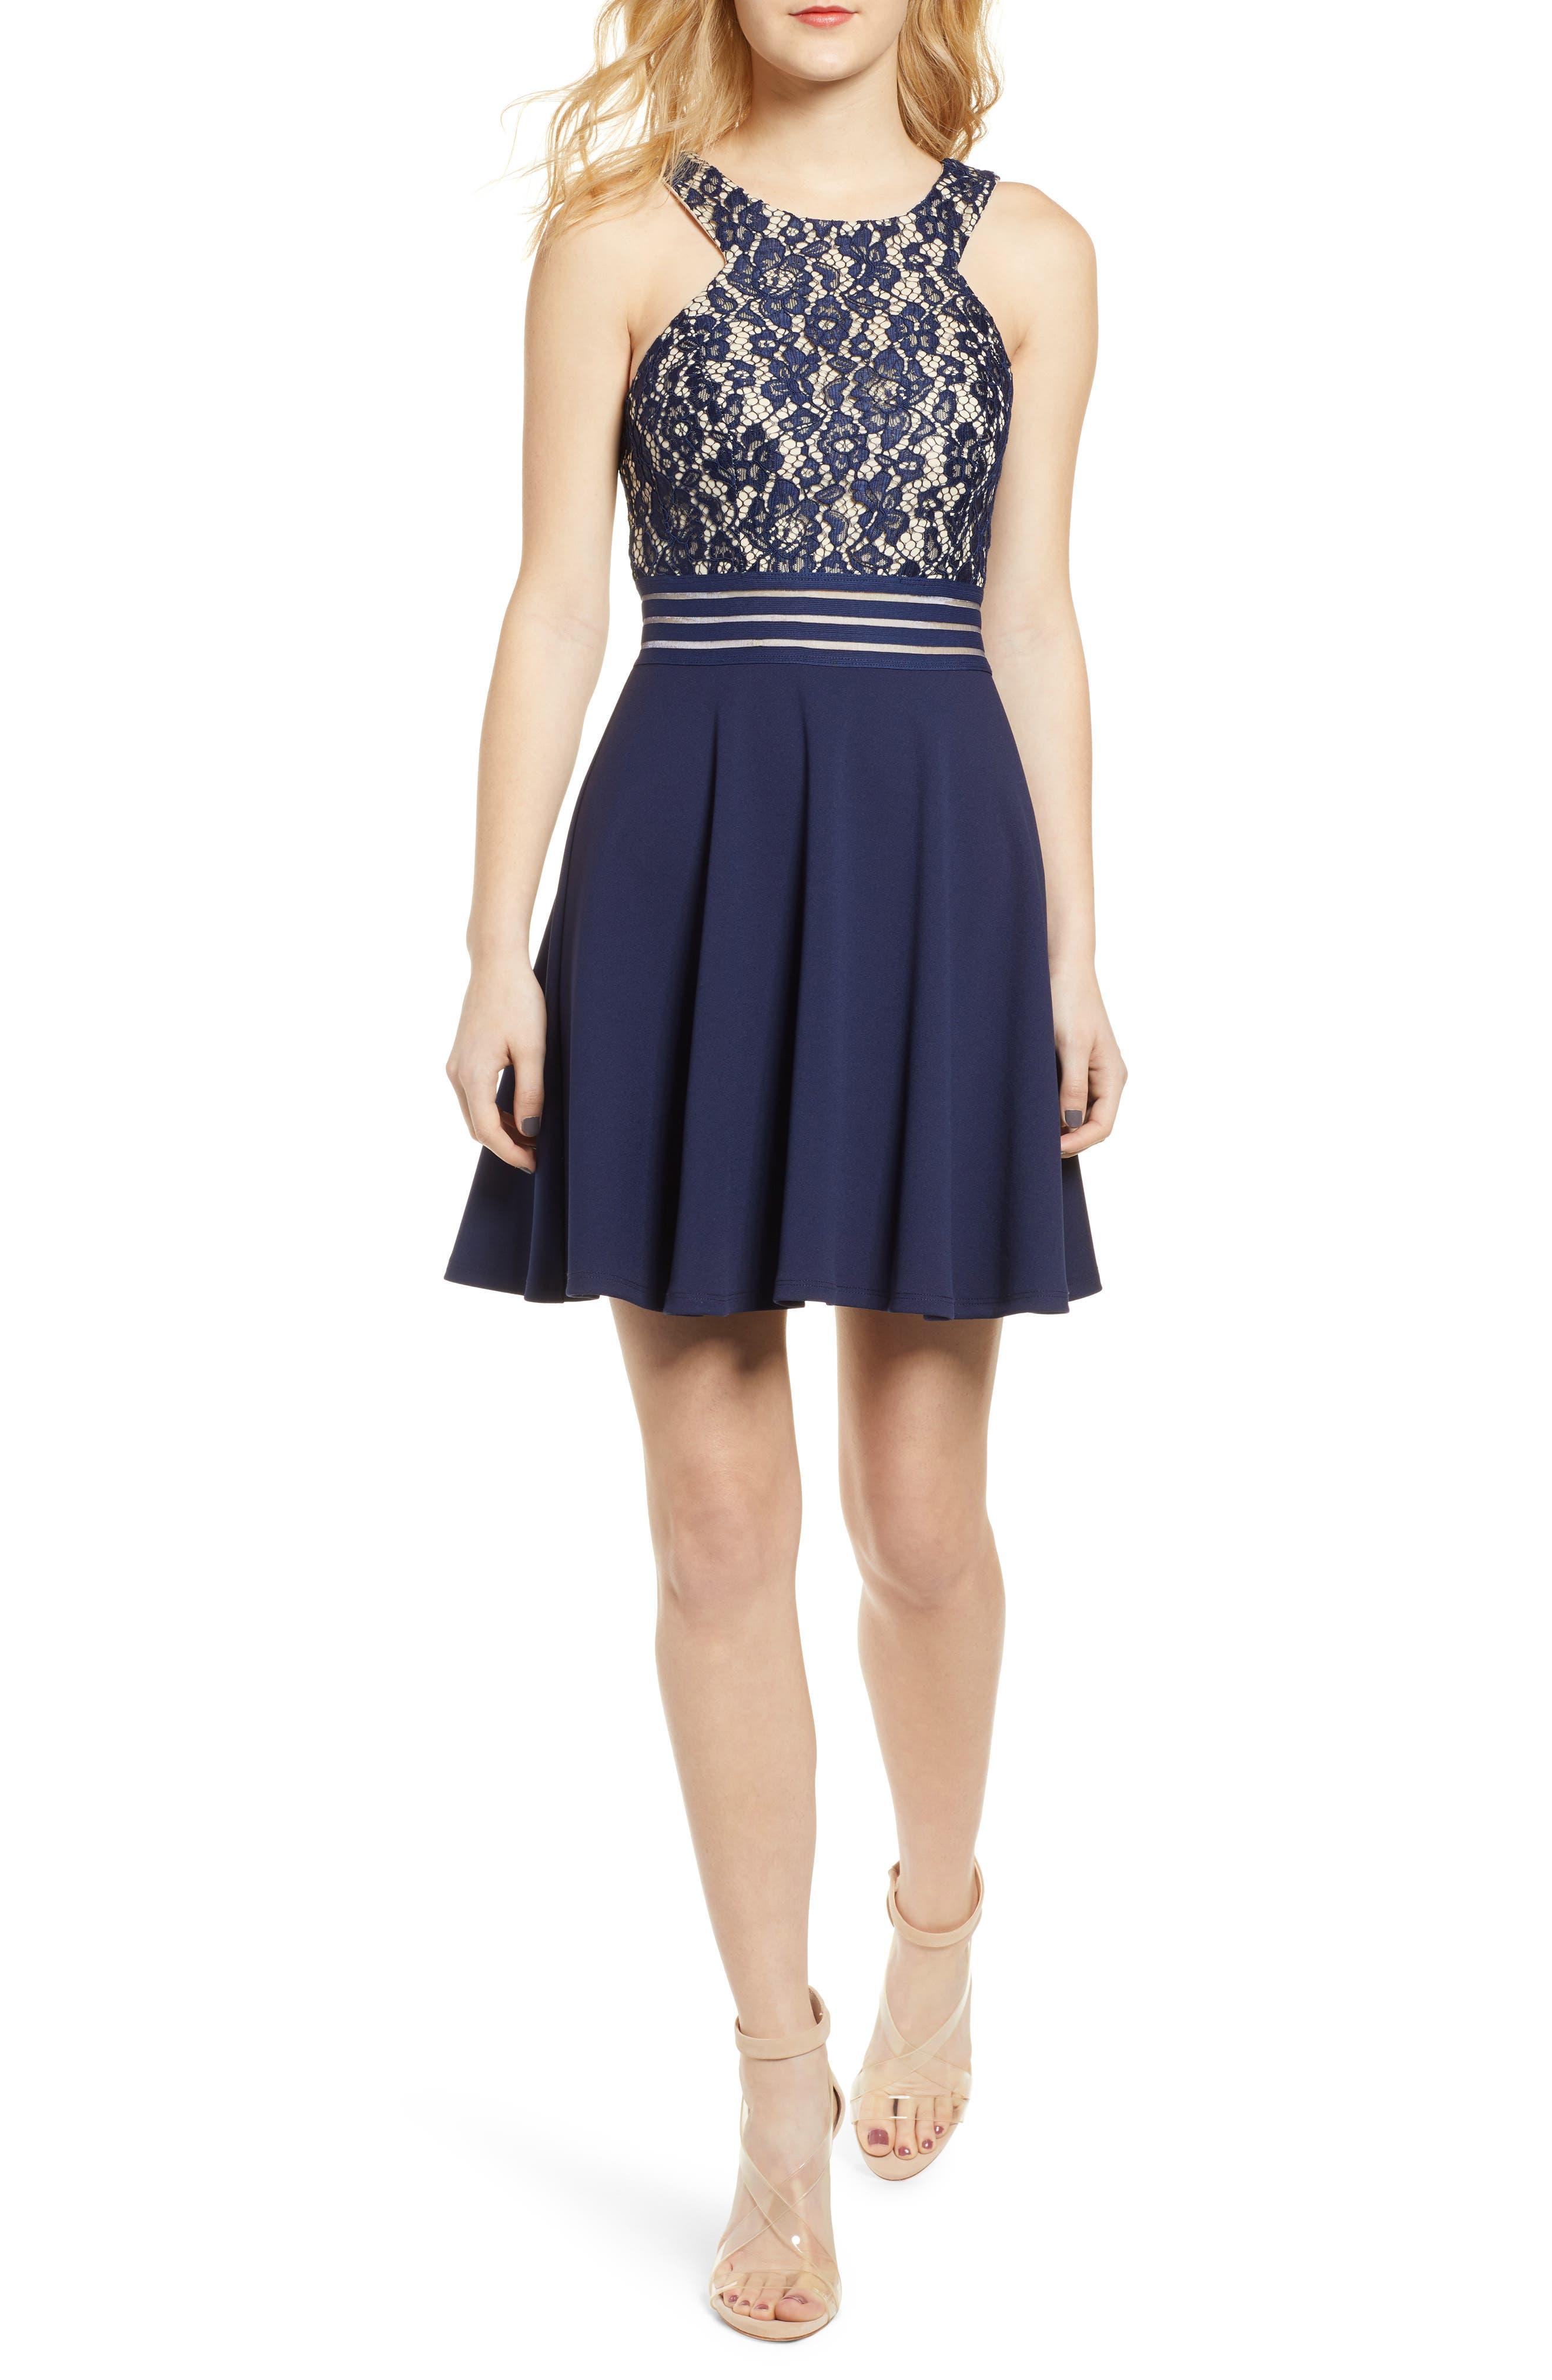 Women's Clothing Faithful Milly New York Navy Blue & White Stretch Knit Mini Skirt Sz S